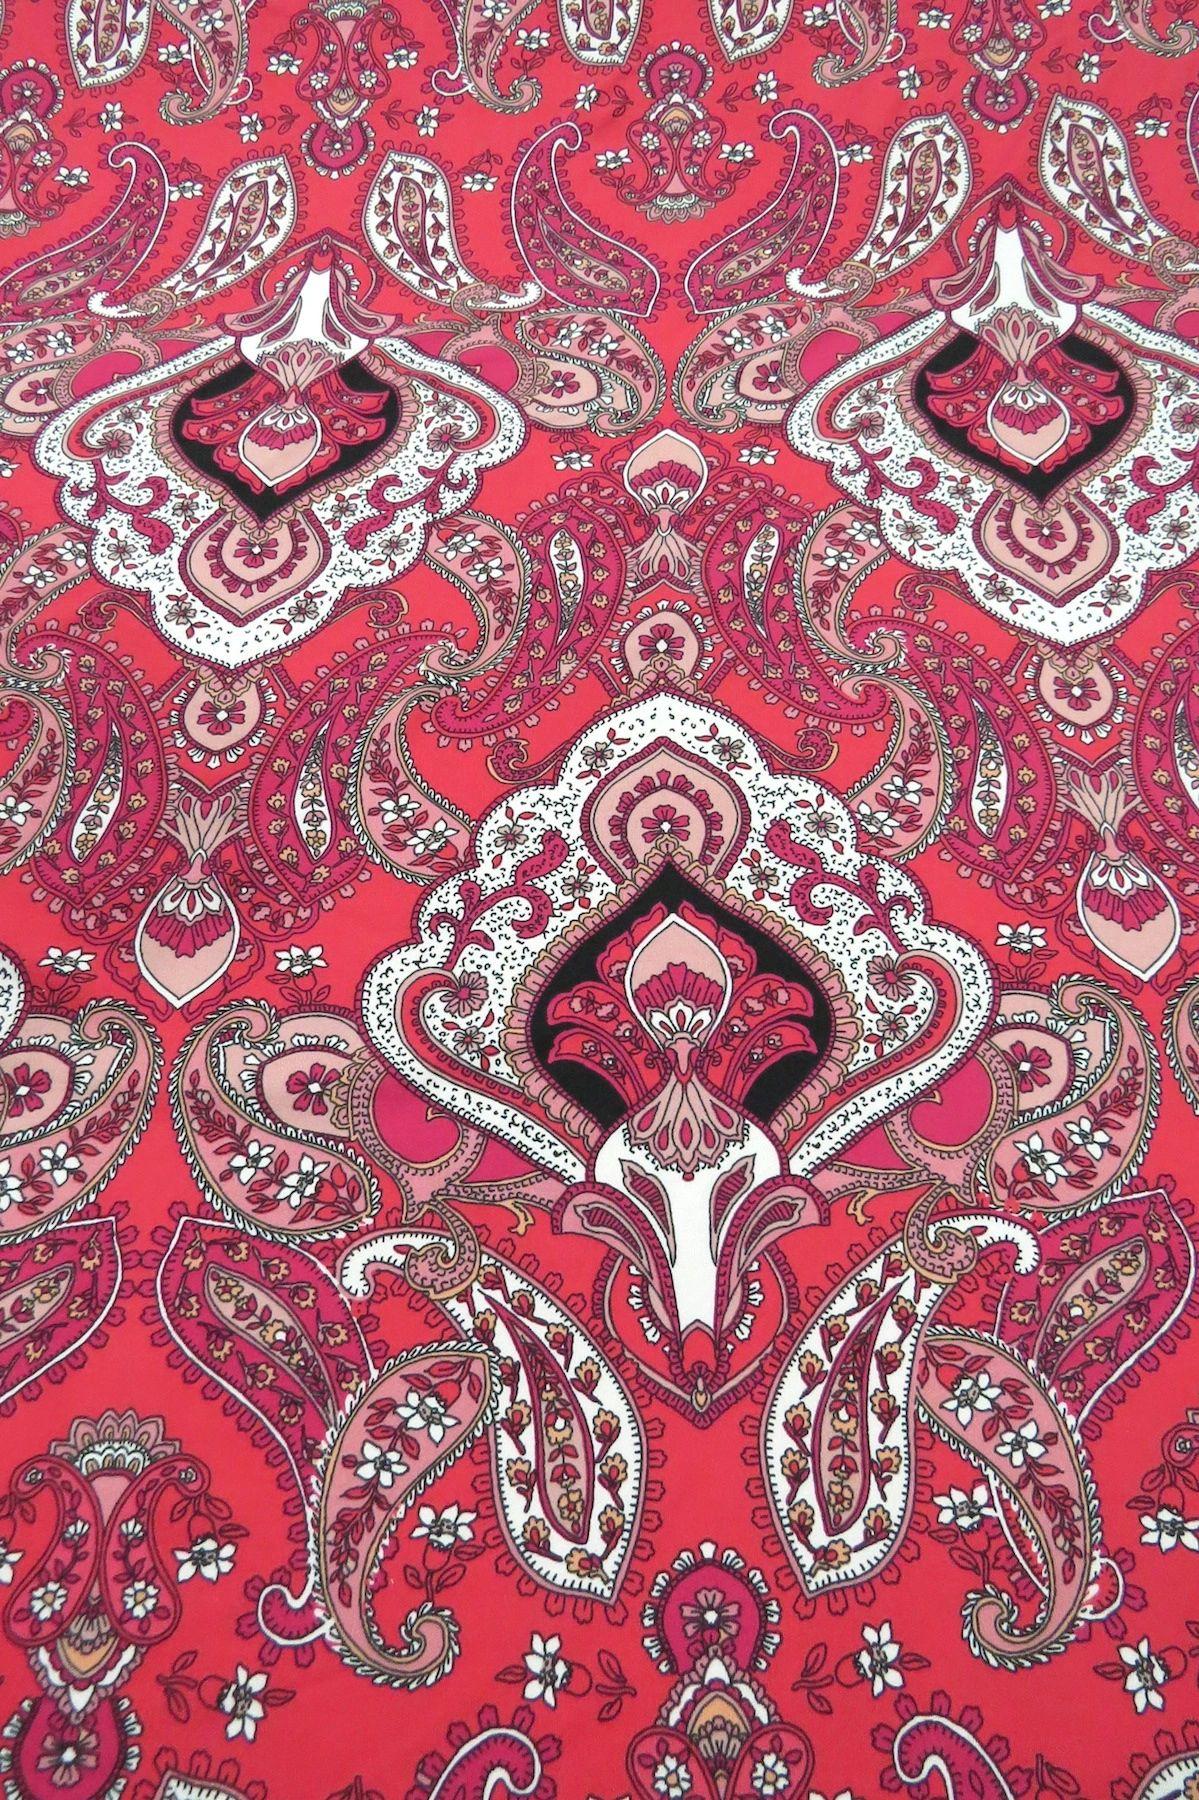 Deep Raspberry Pink/White/Black Stylized Paisley Print Double Brushed Jersey Knit